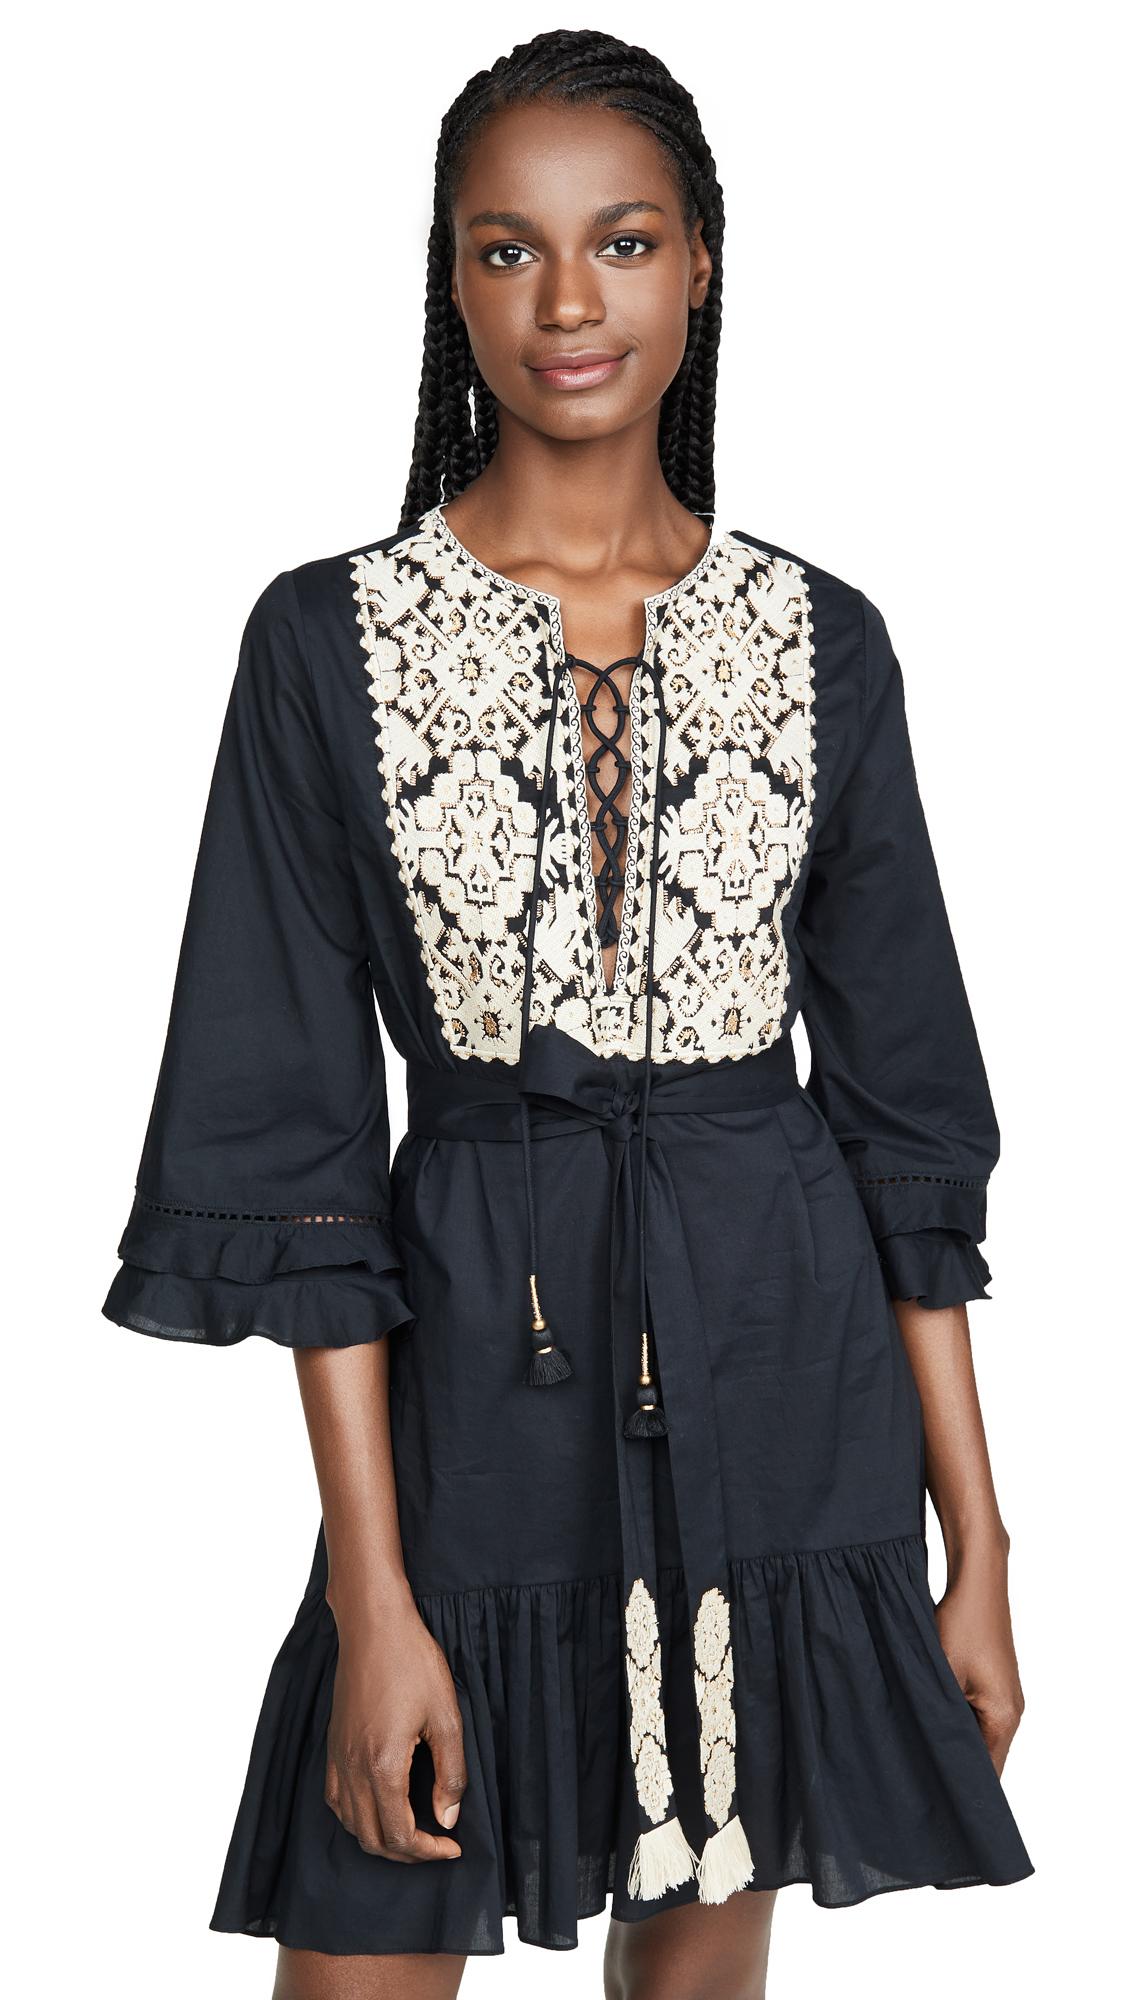 Figue Leona Dress - 50% Off Sale